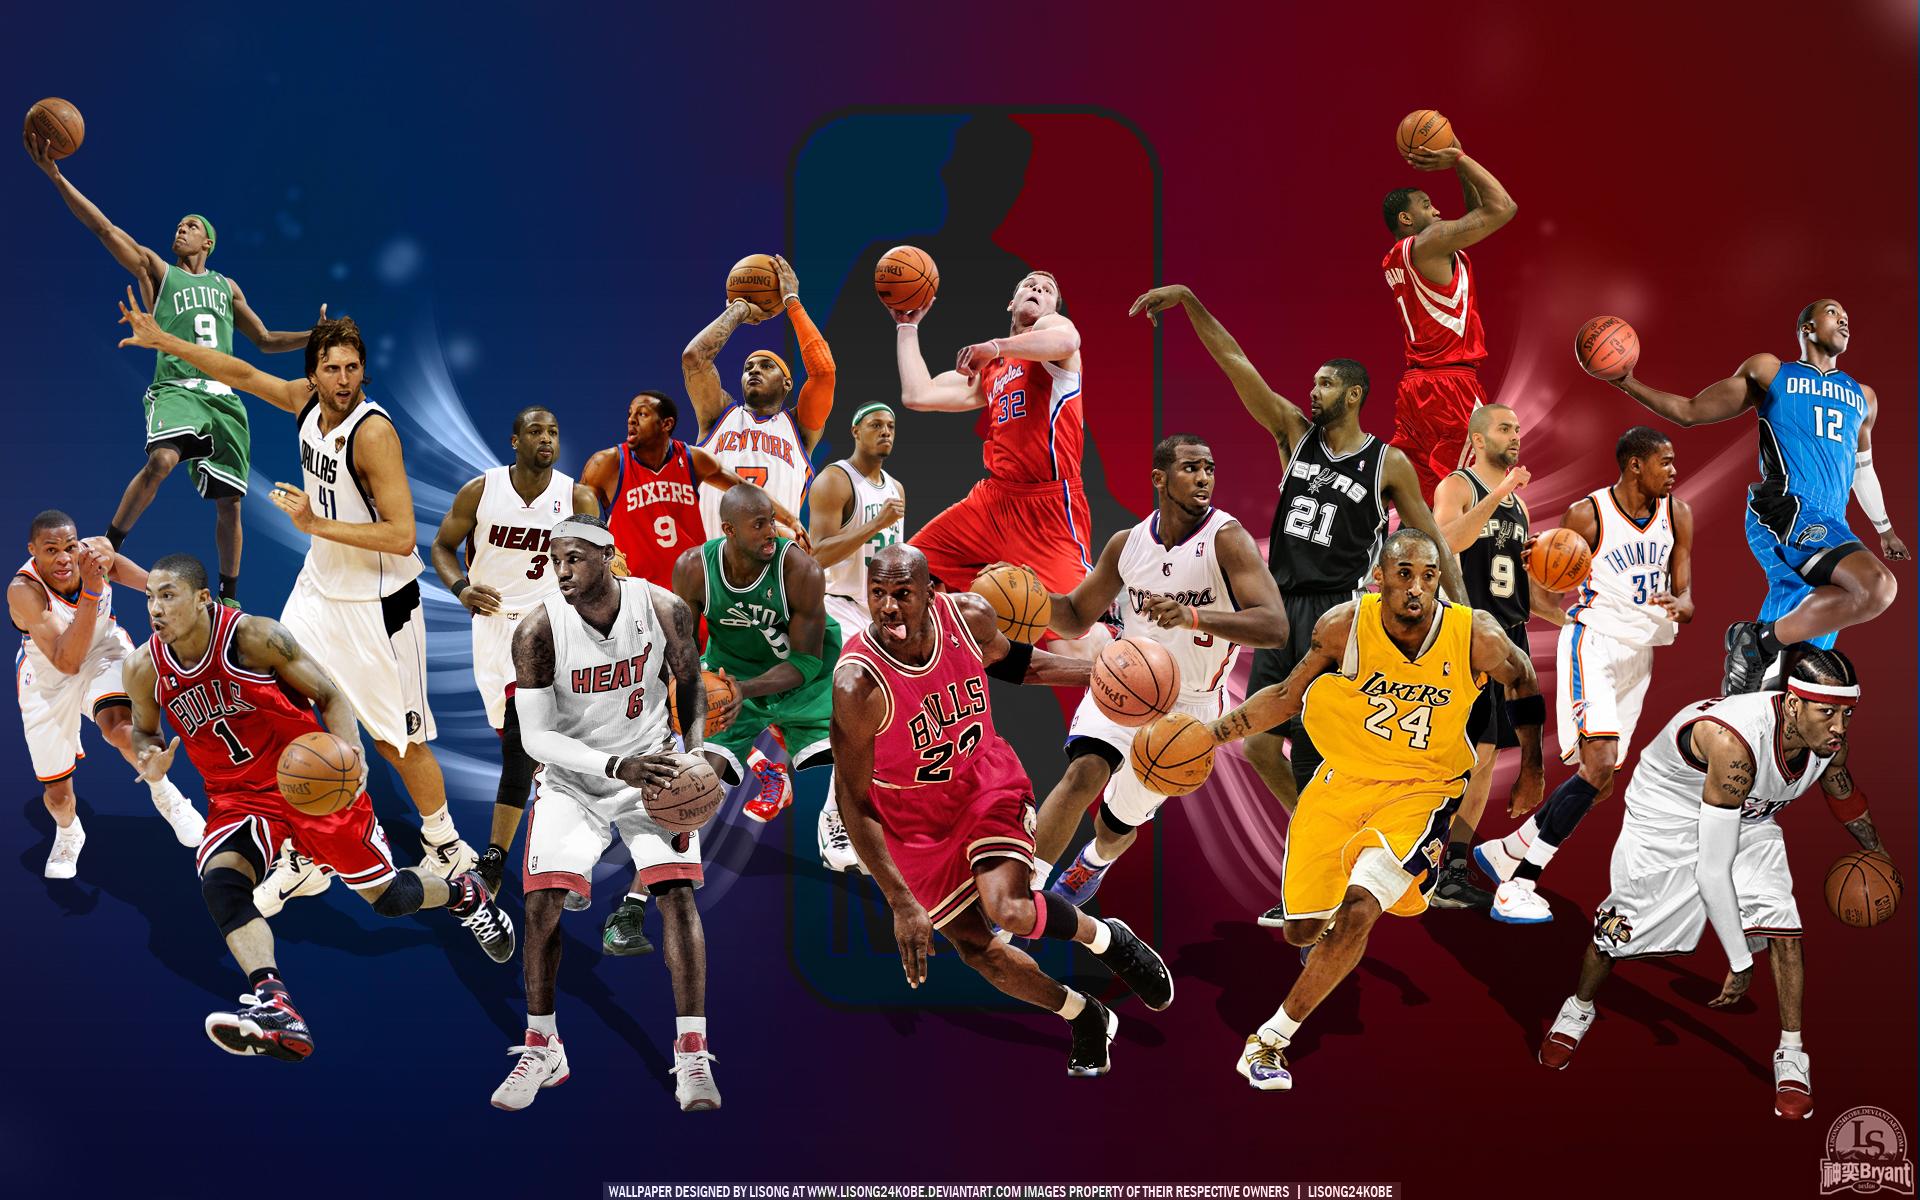 NBA Basketball HD Wallpapers - WallpaperSafari